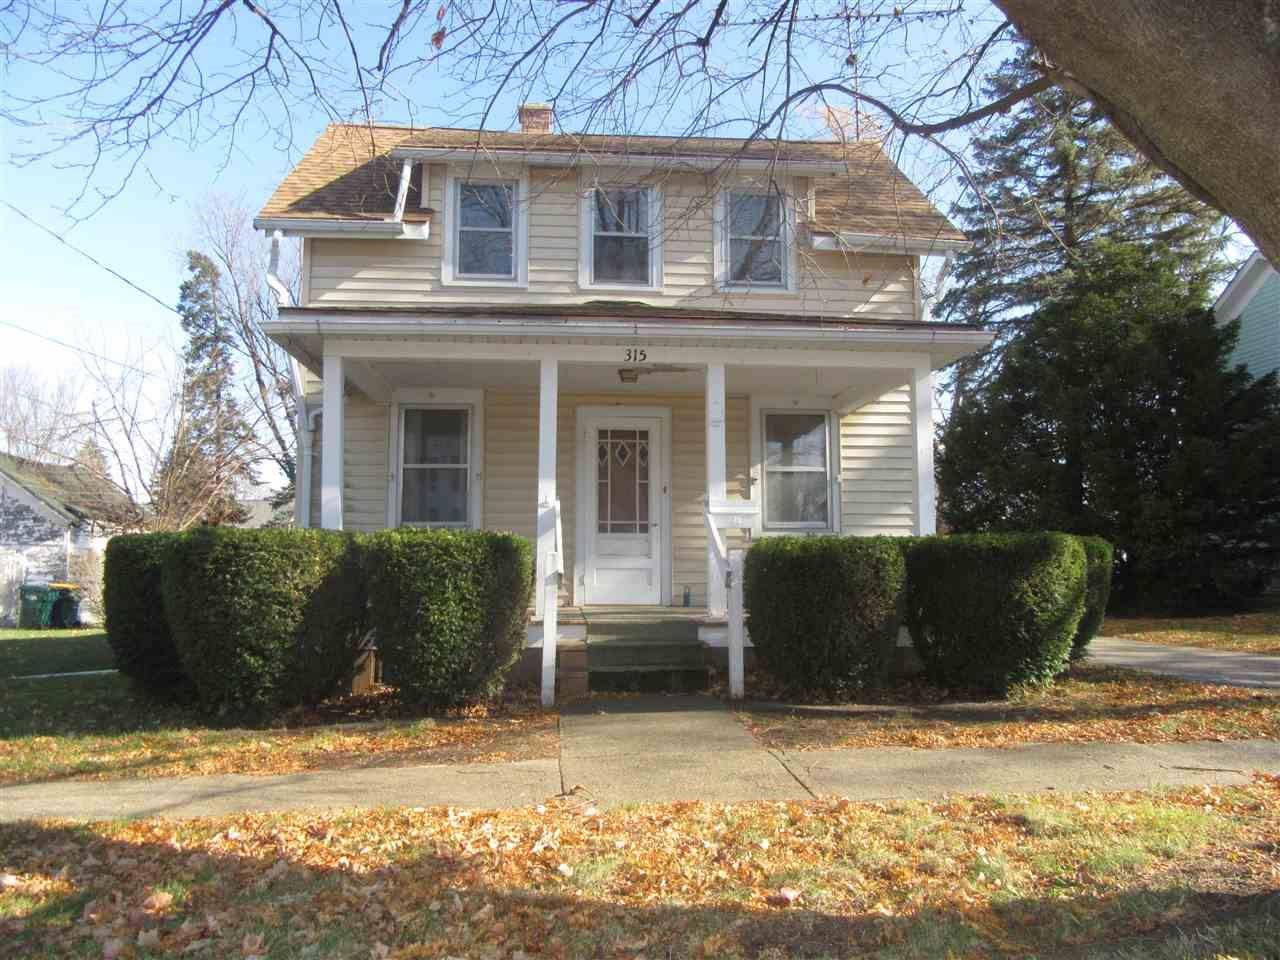 315 Durand St, Clinton, WI 53525 - #: 1898061